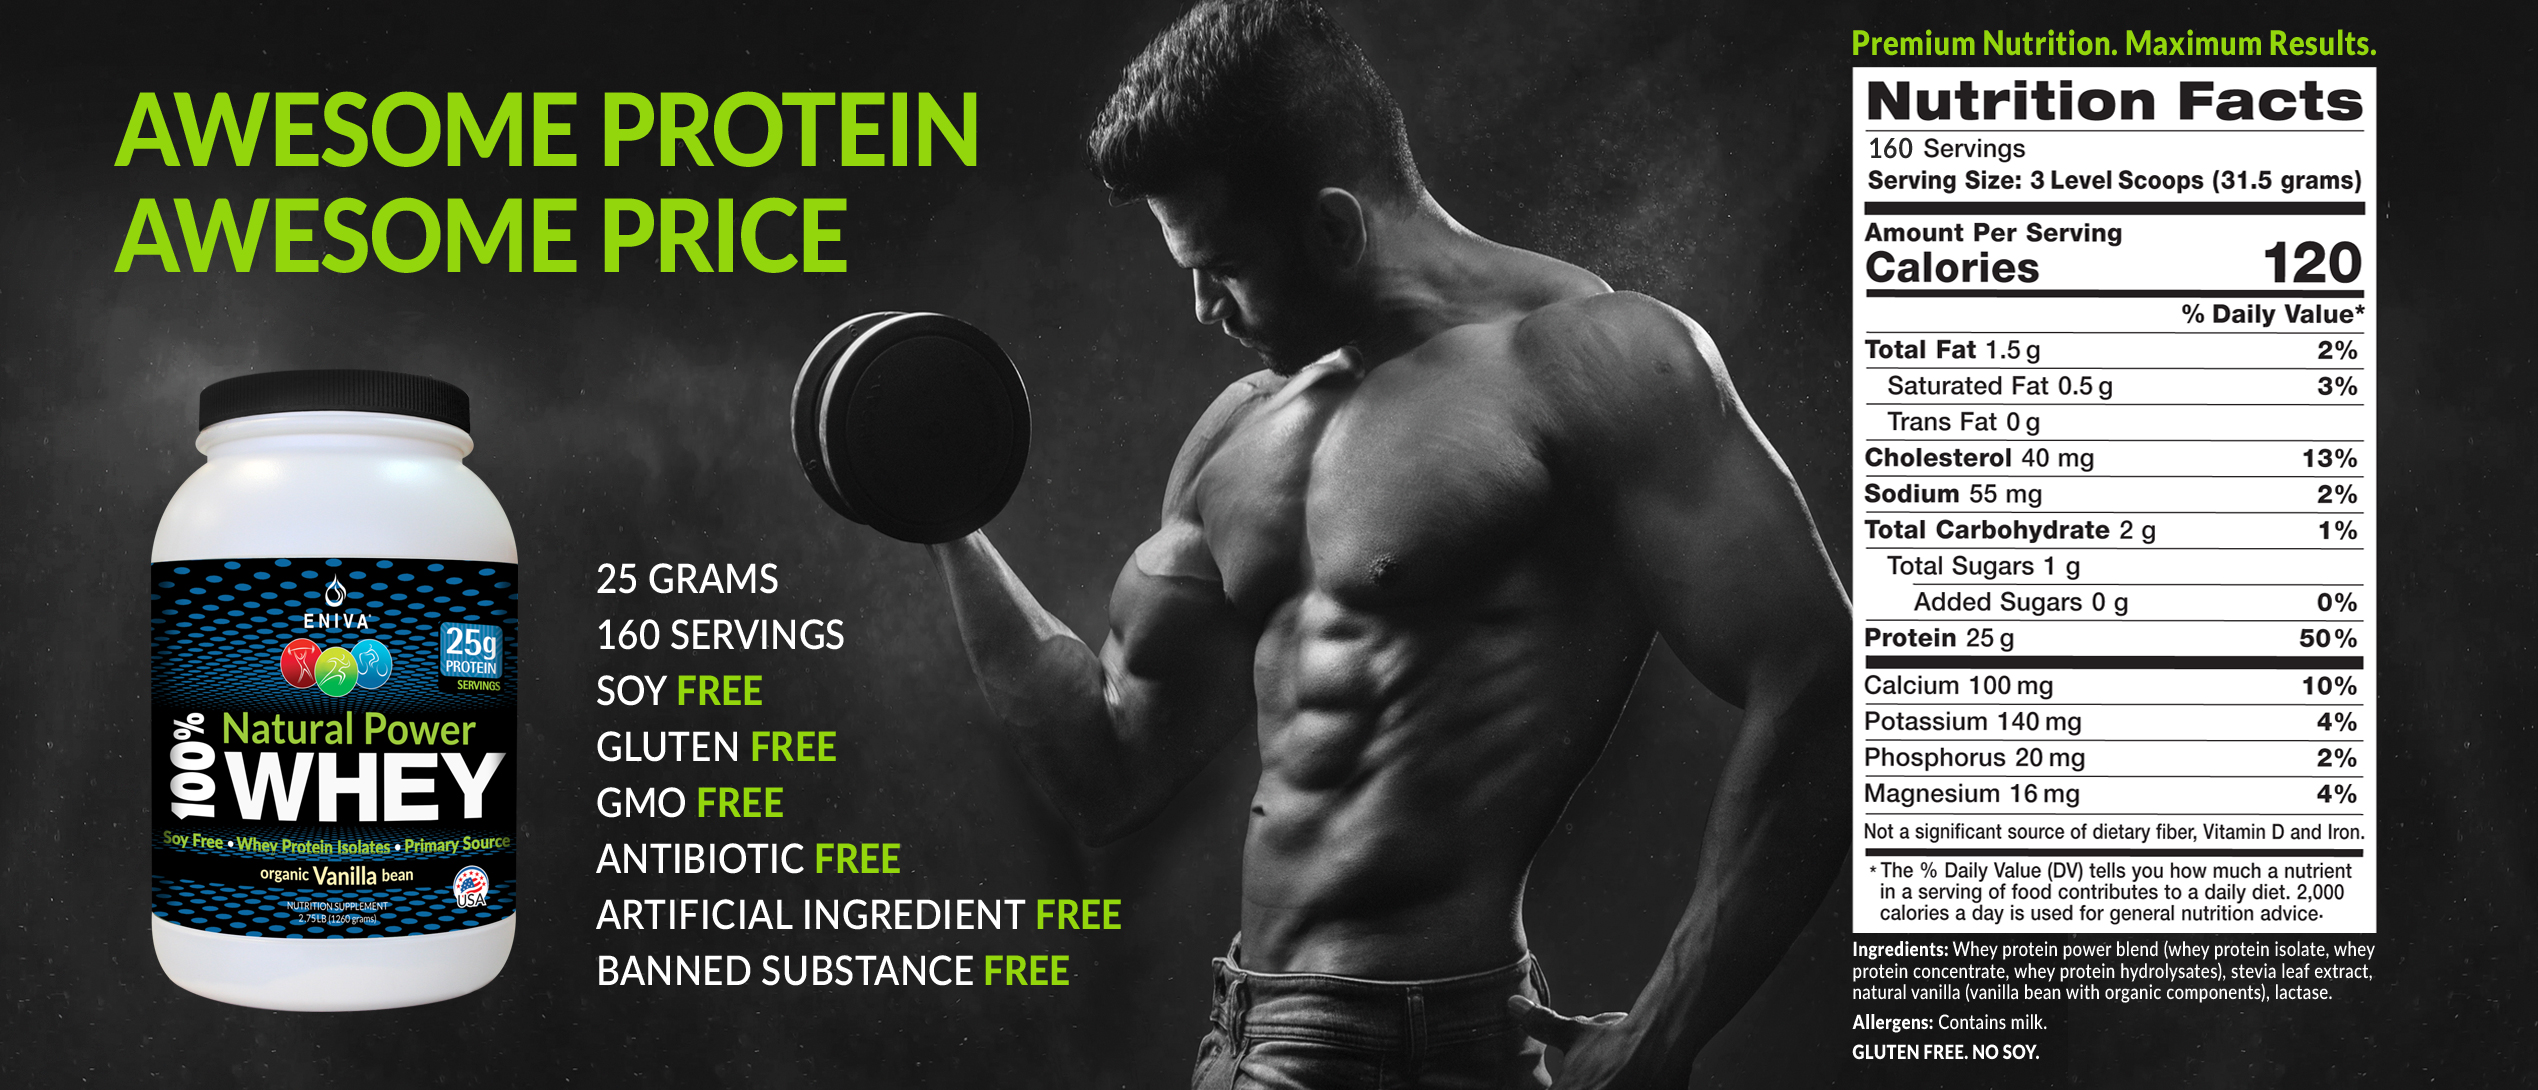 protein-sport-beauty-top-pump-160b.jpg